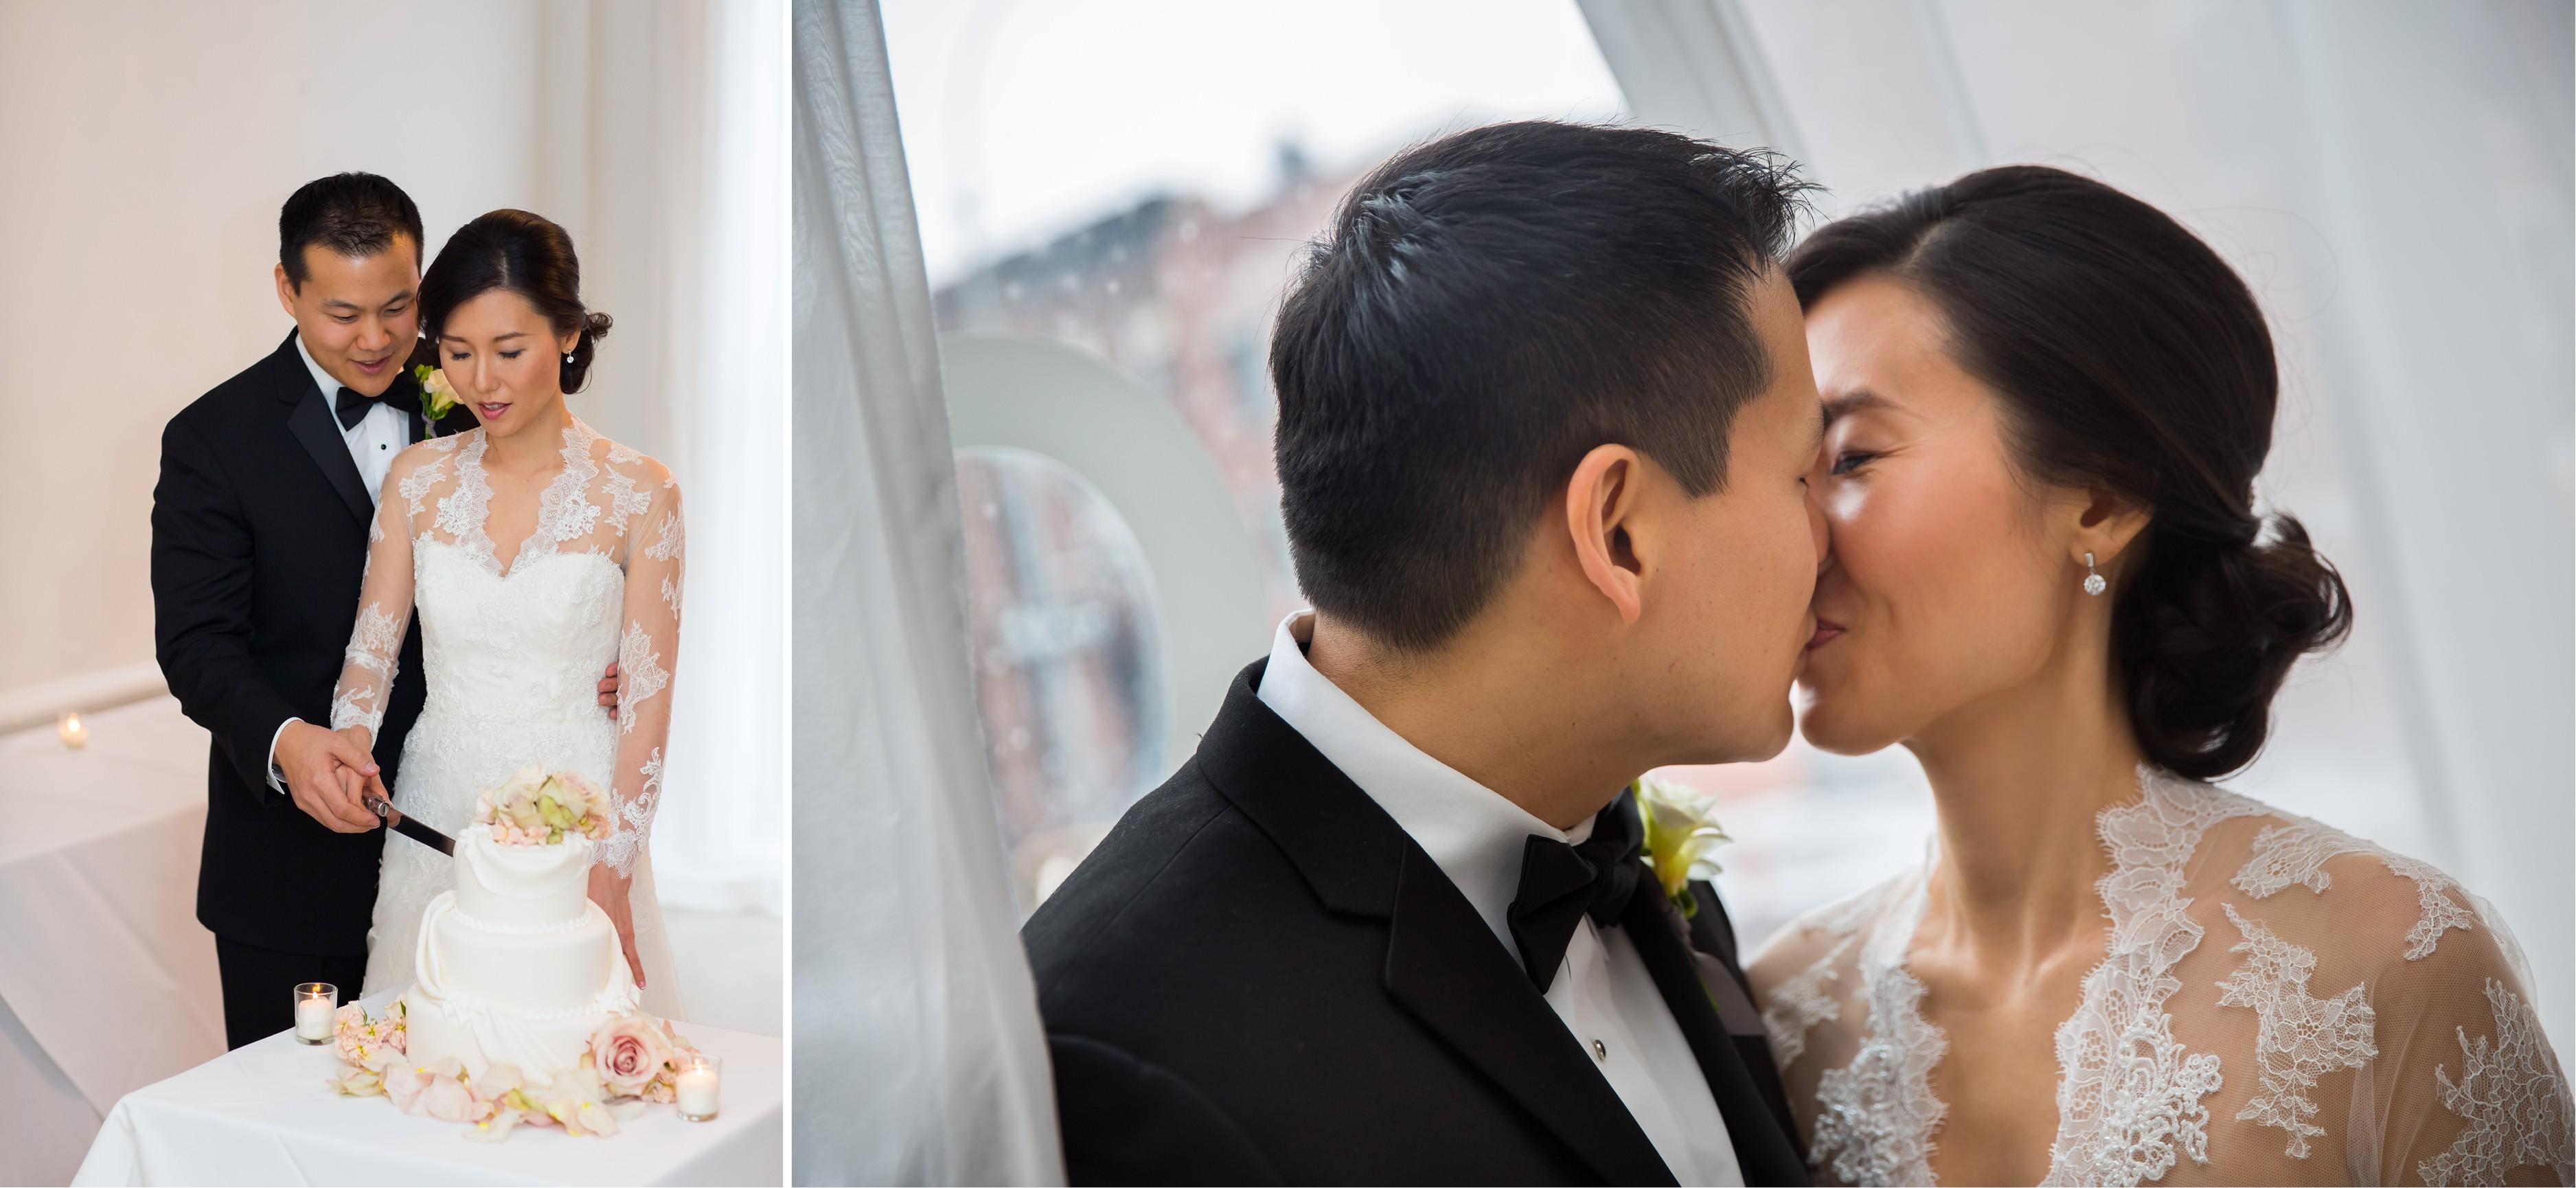 Emma_cleary_photography ici wedding23